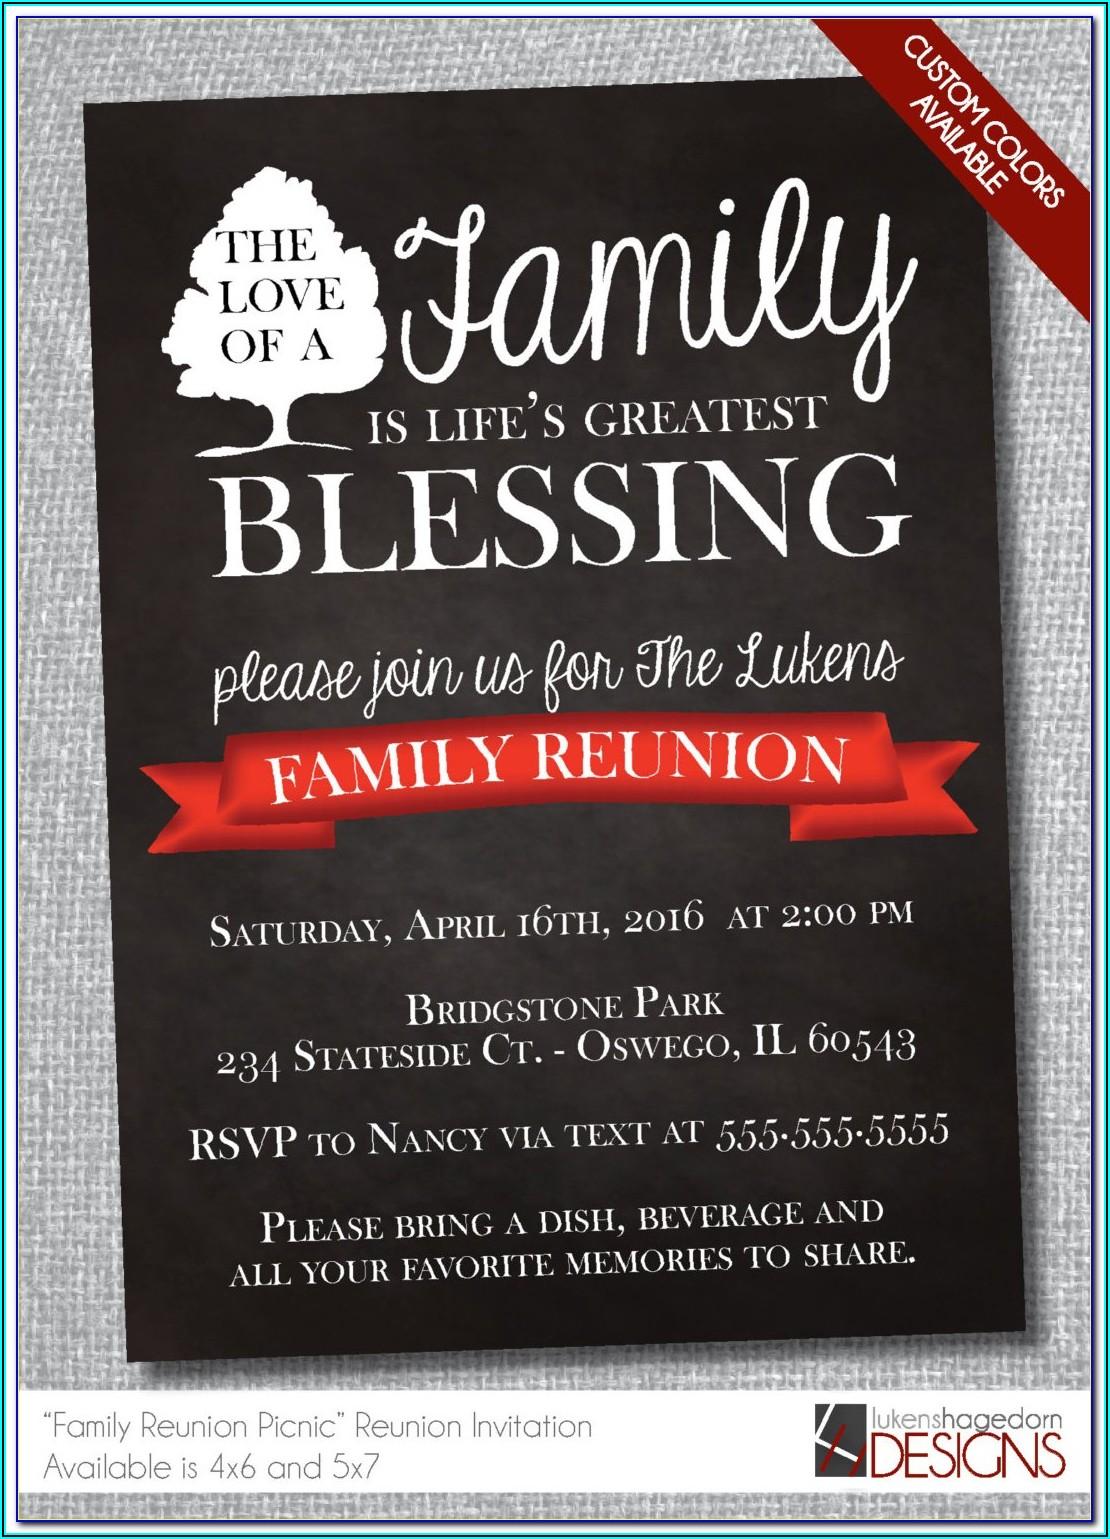 Family Reunion Invitation Wording Ideas